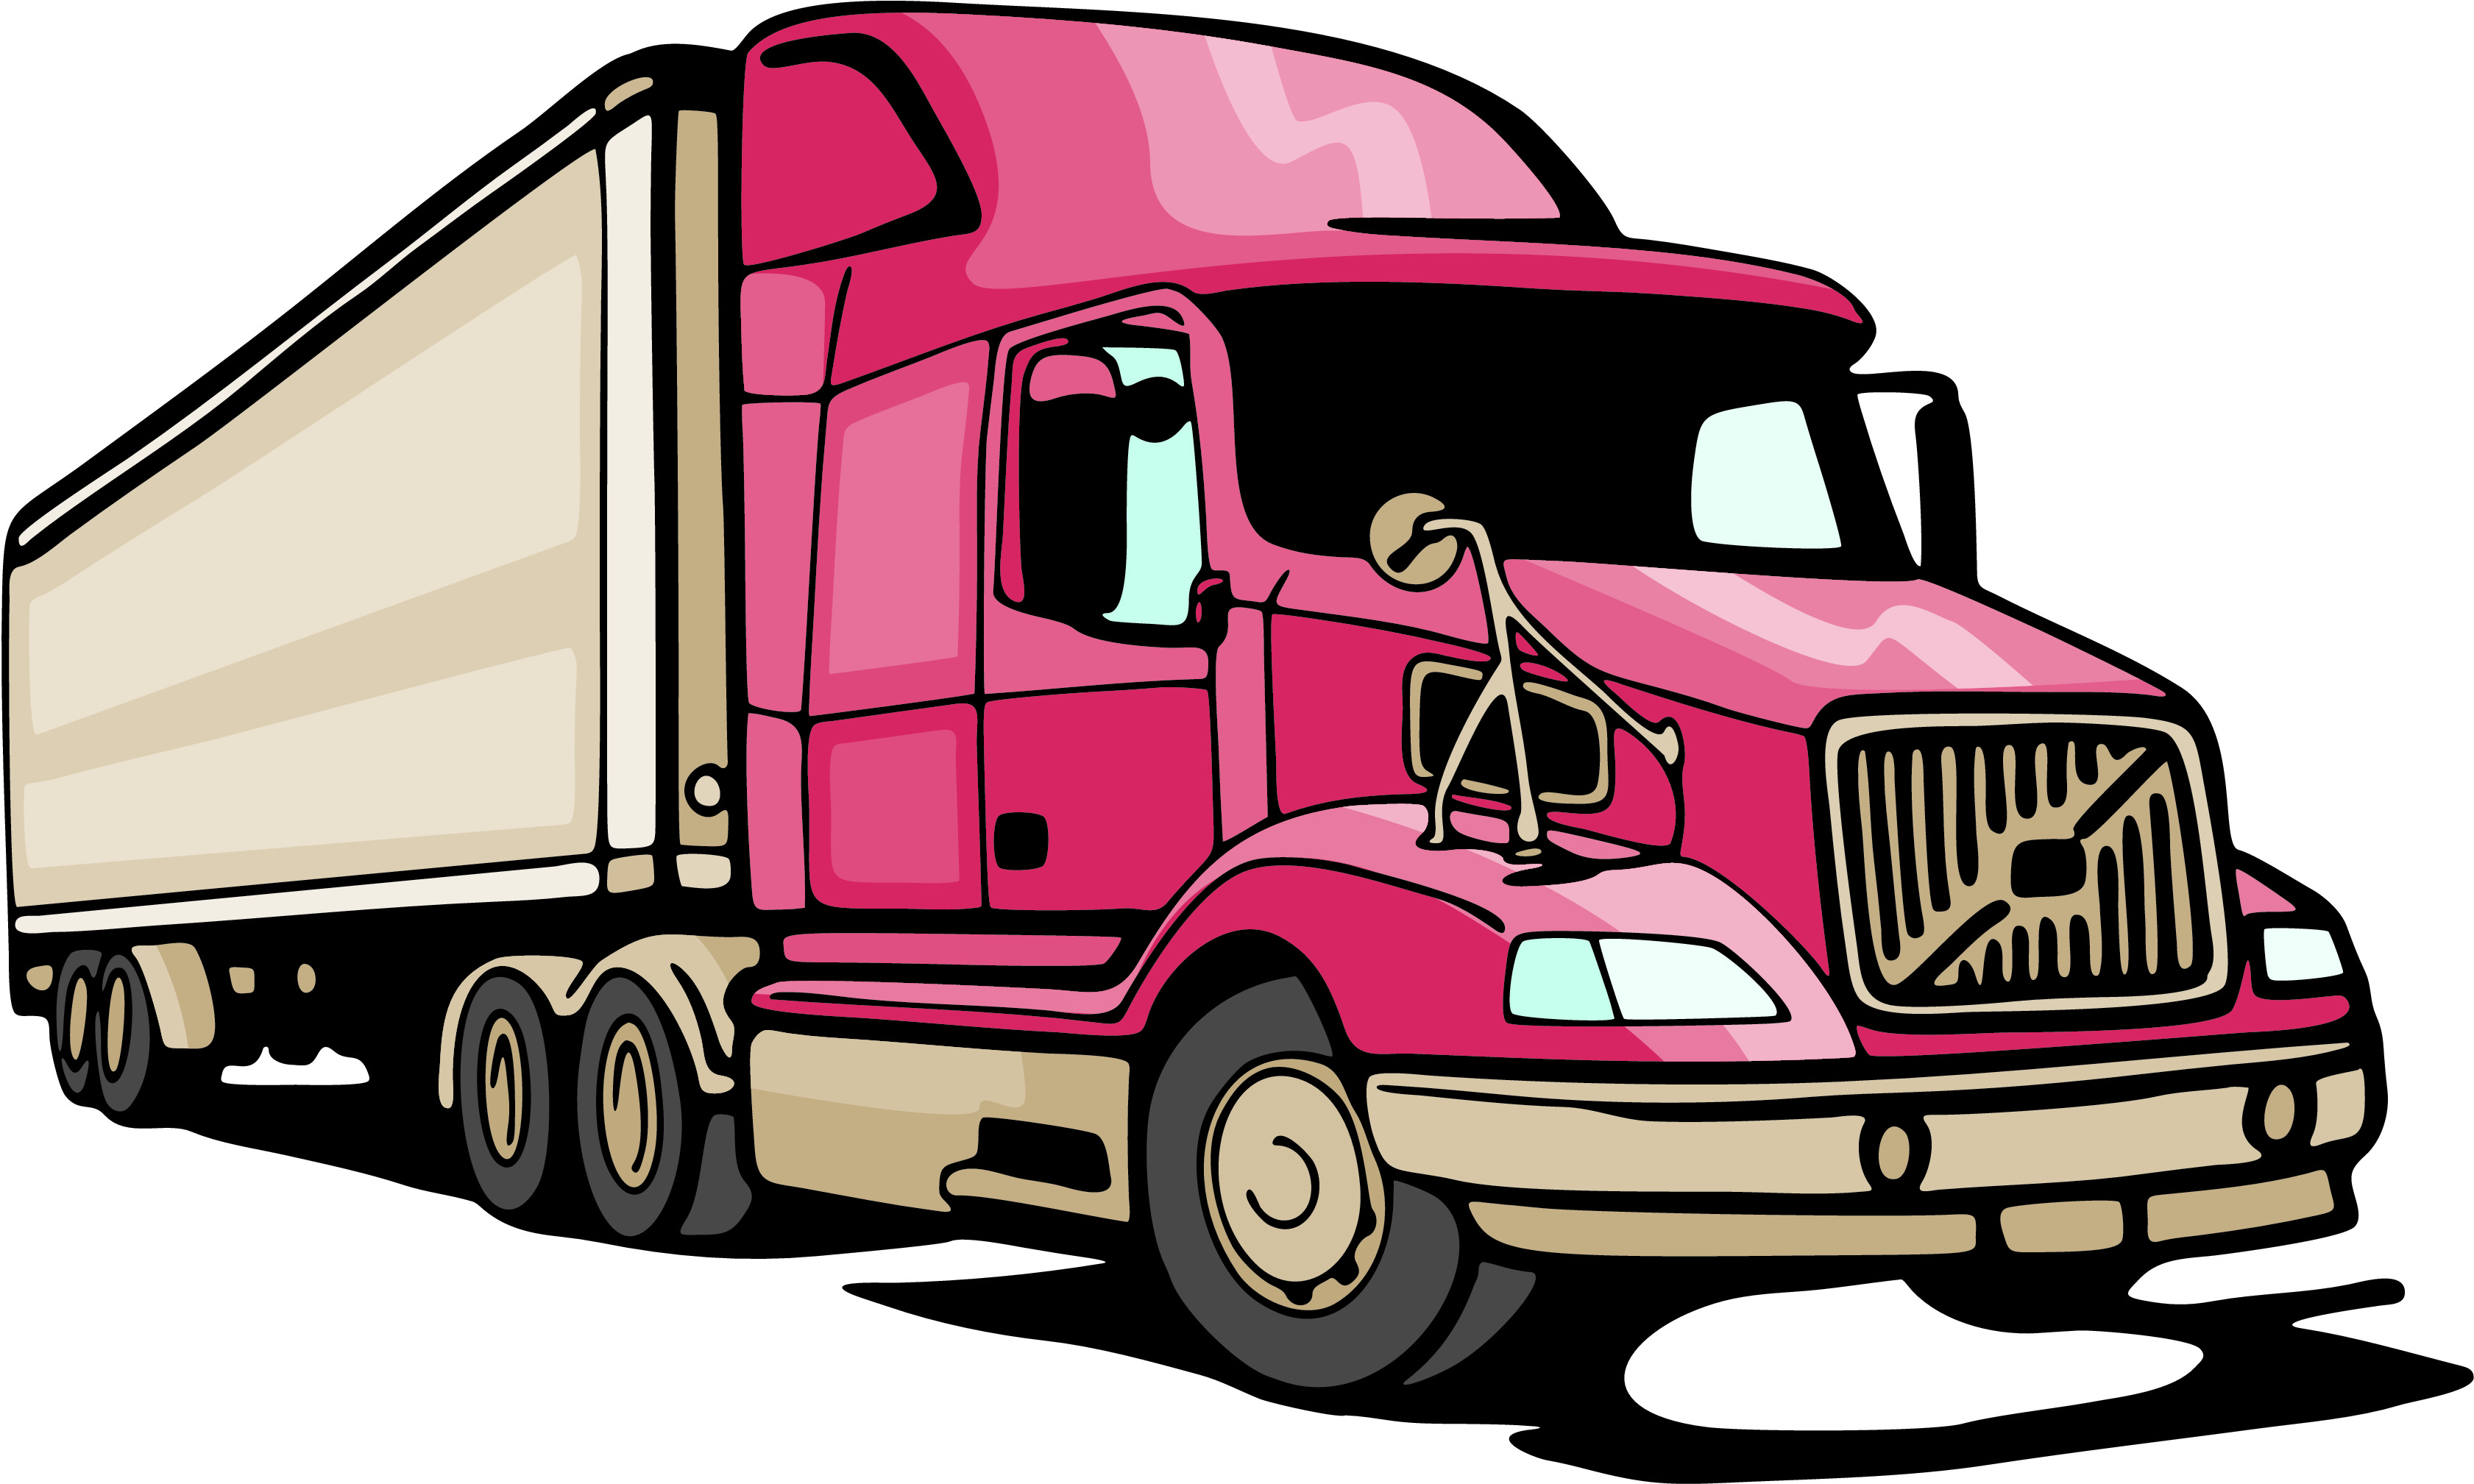 Pulido Transportation Inc